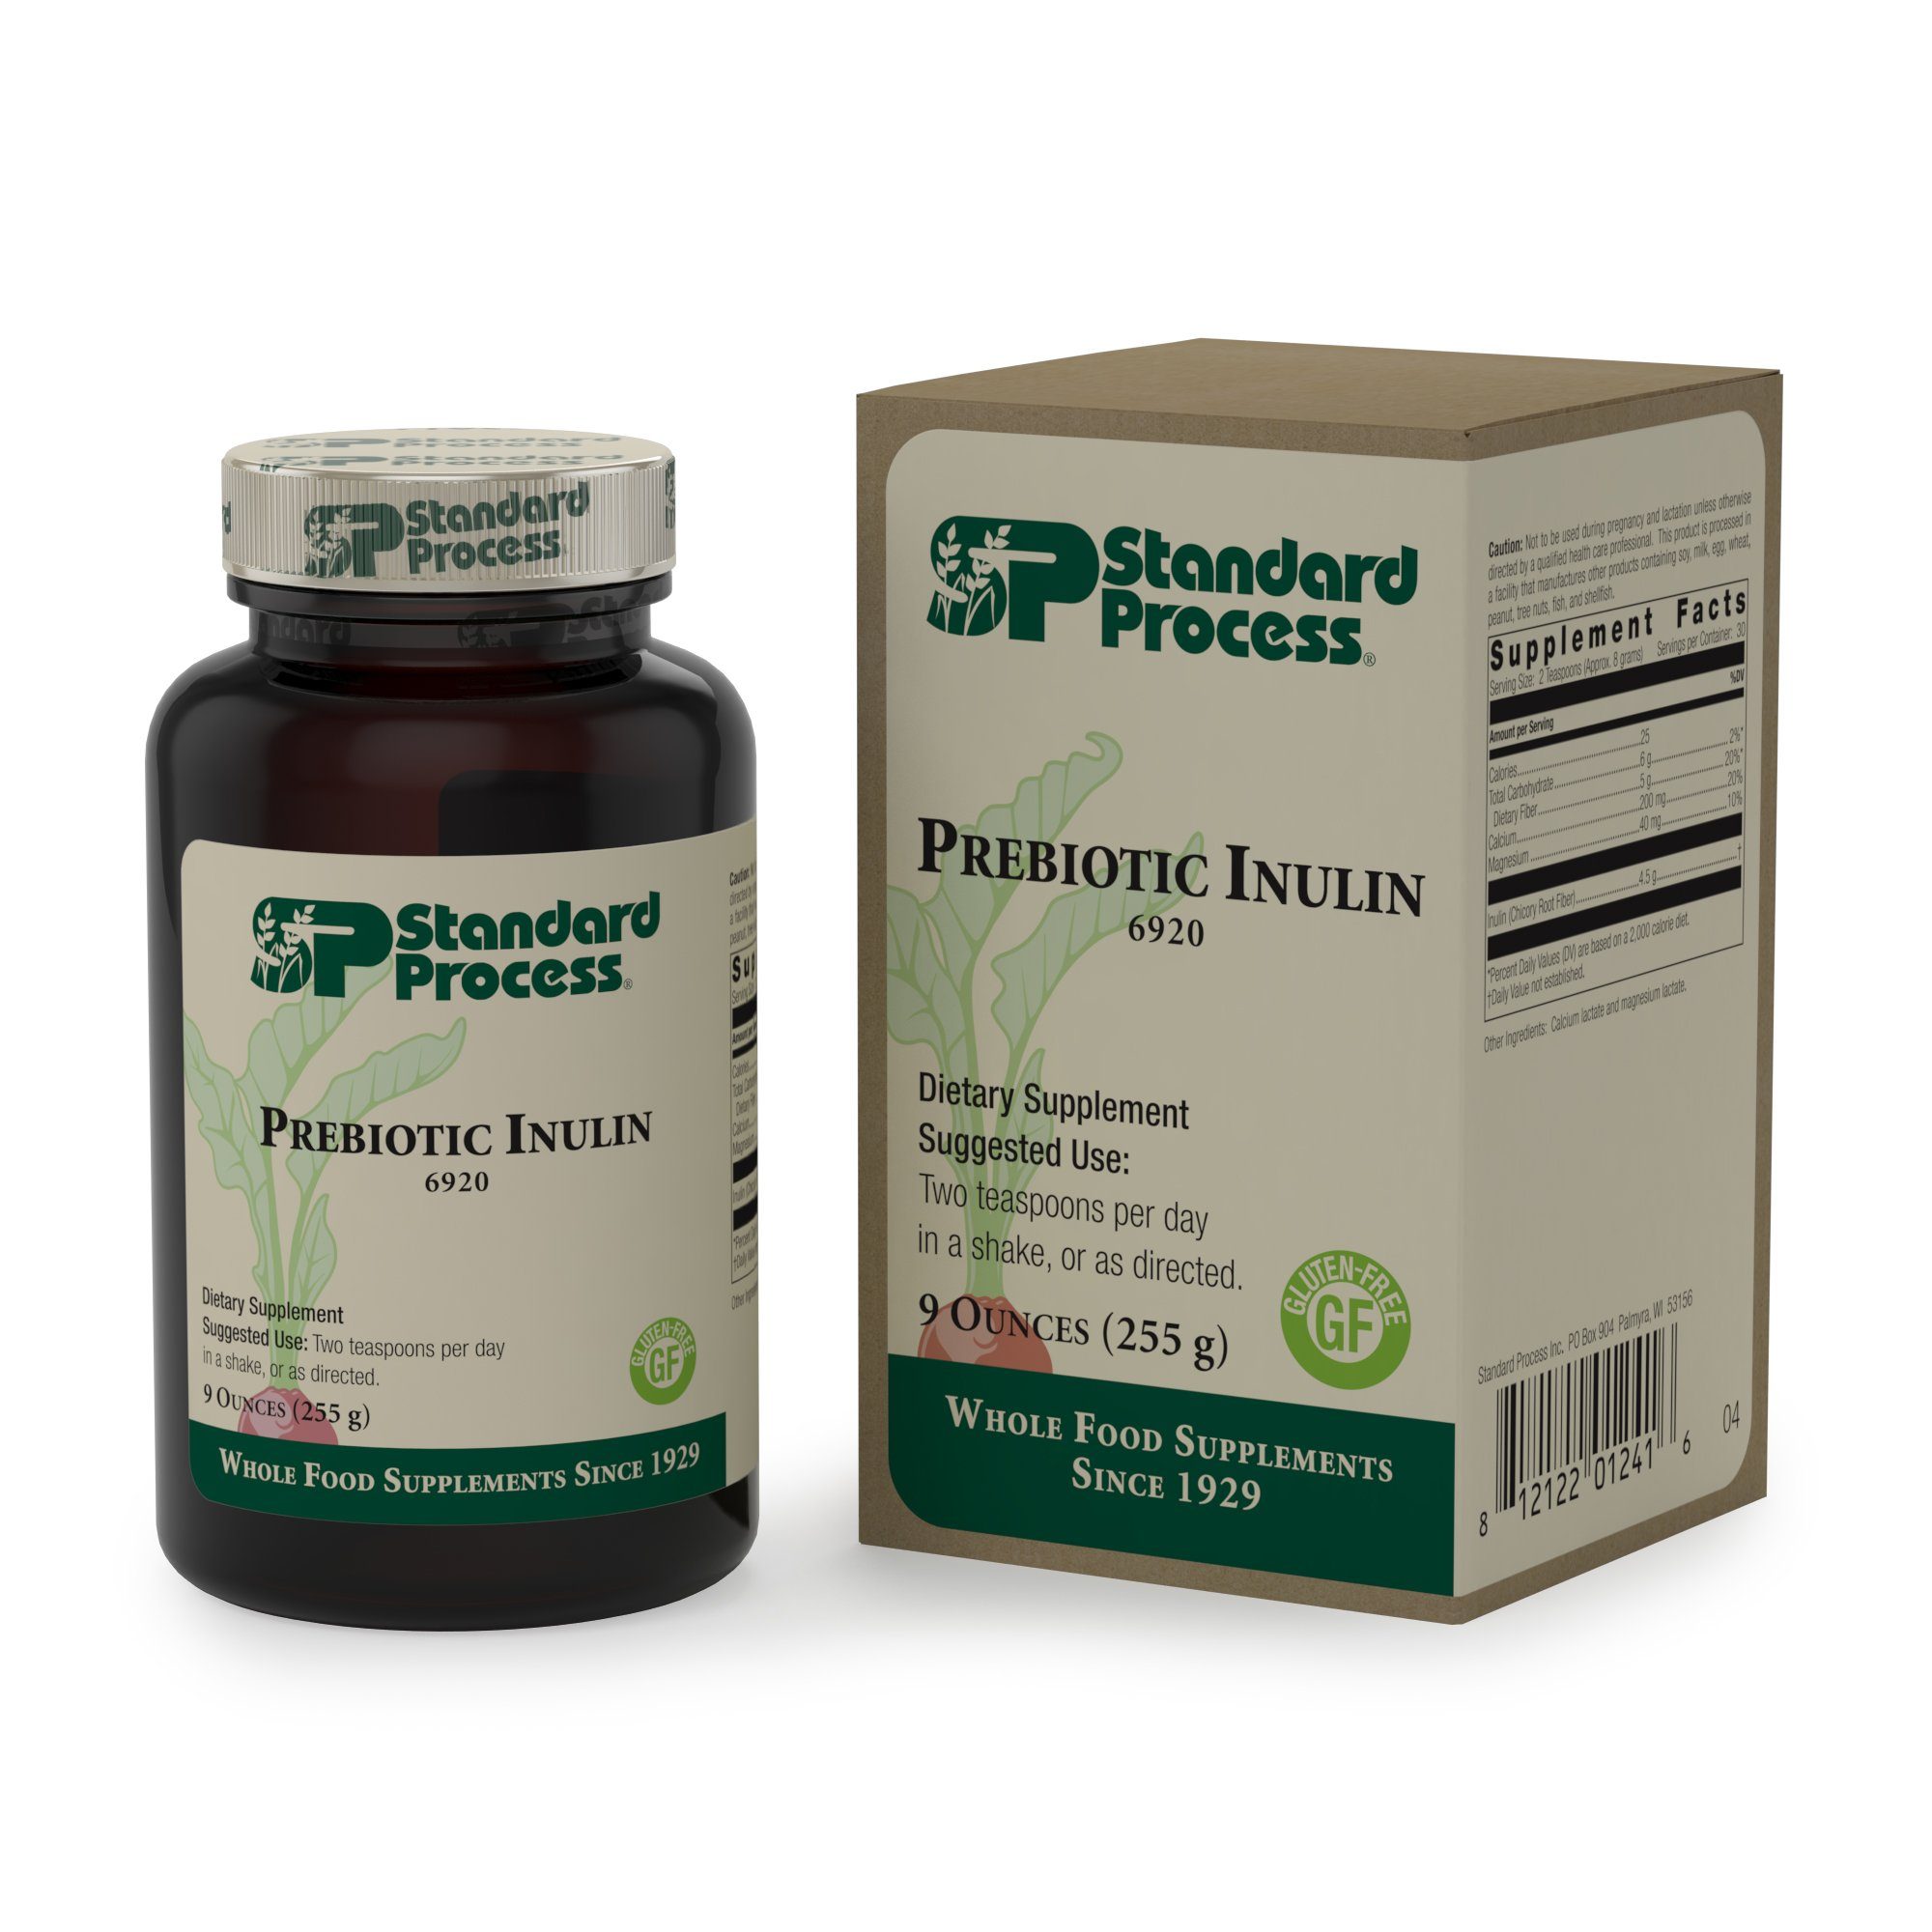 Standard Process - Prebiotic Inulin Powder - 9 oz. (255 g)